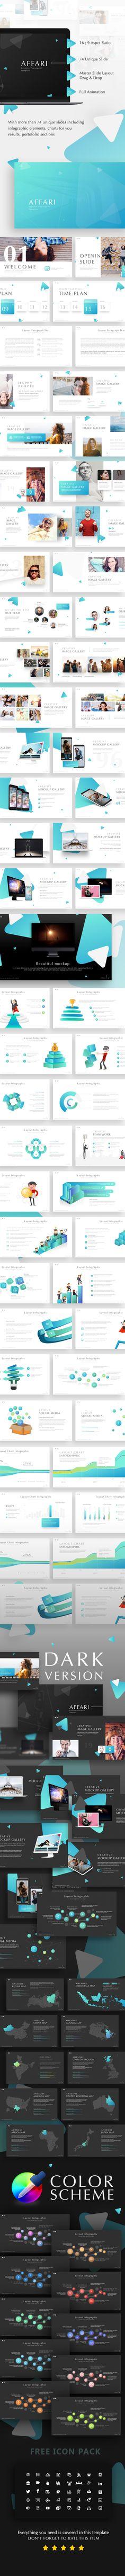 Affari Powerpoint Templates - Presentation Templates